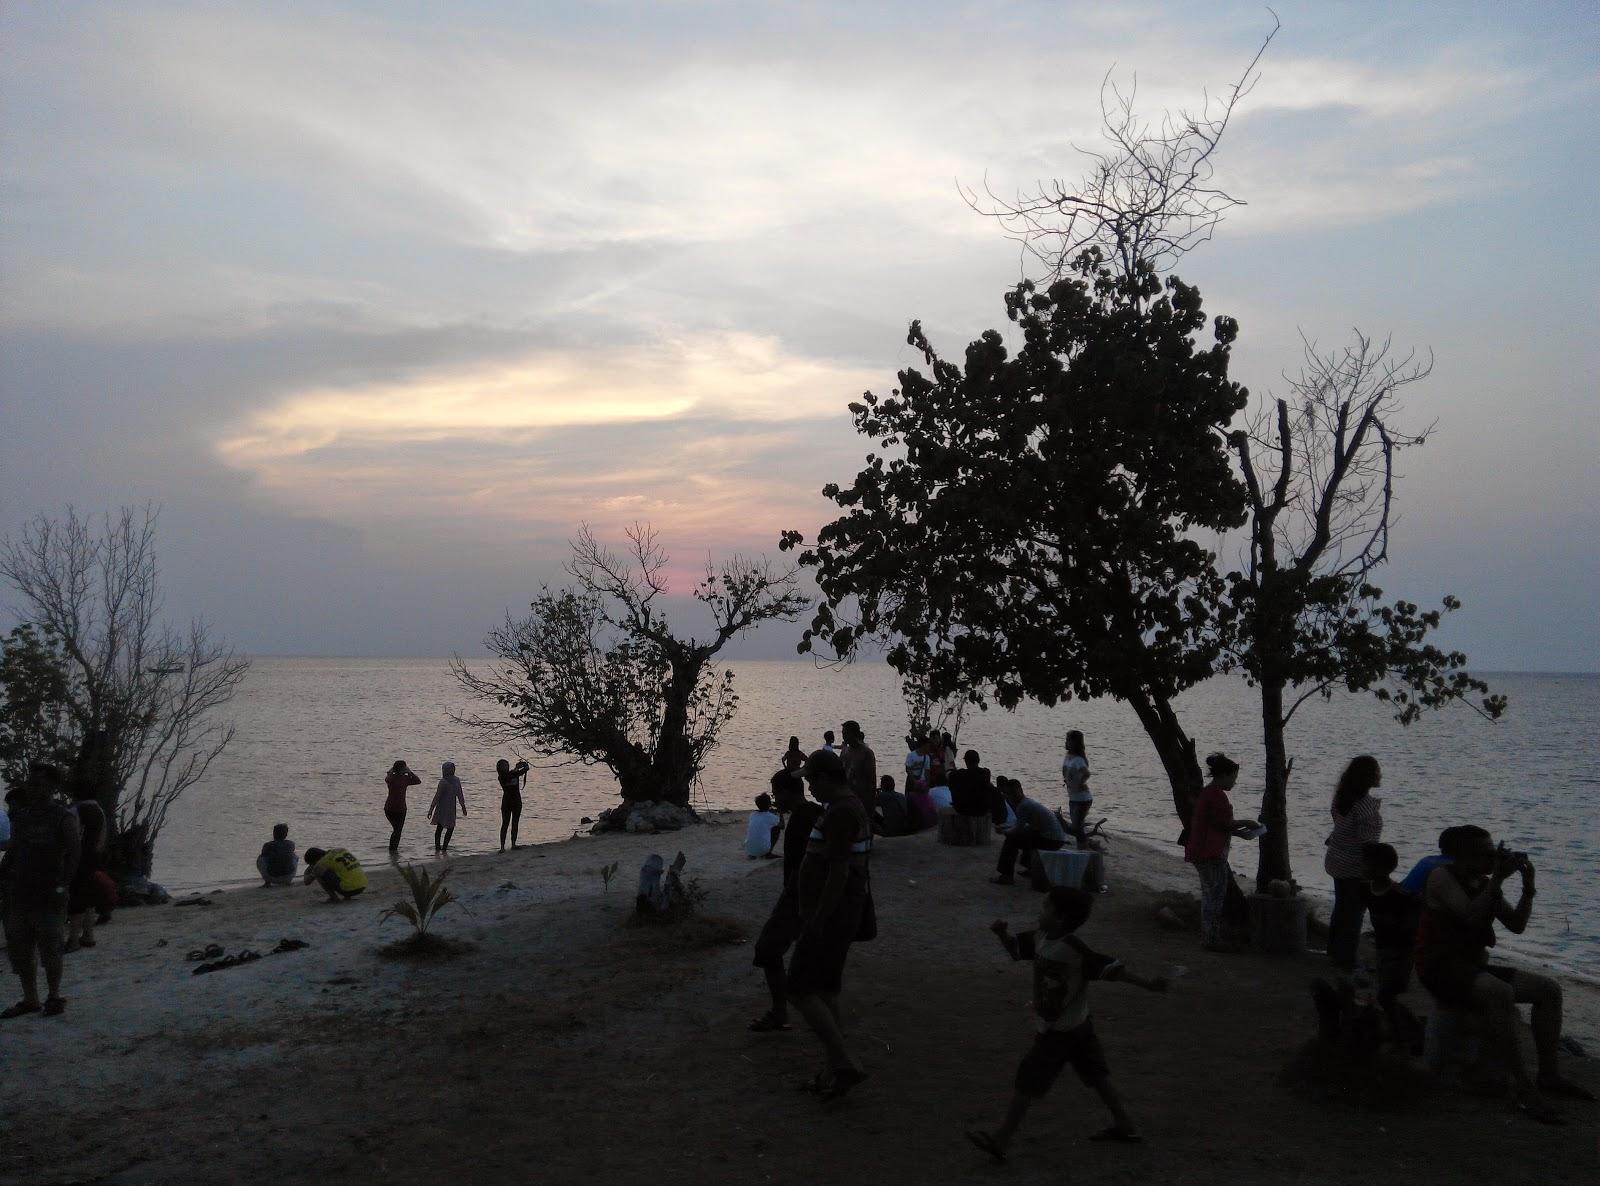 Tanjung Barat Pulau Tidung